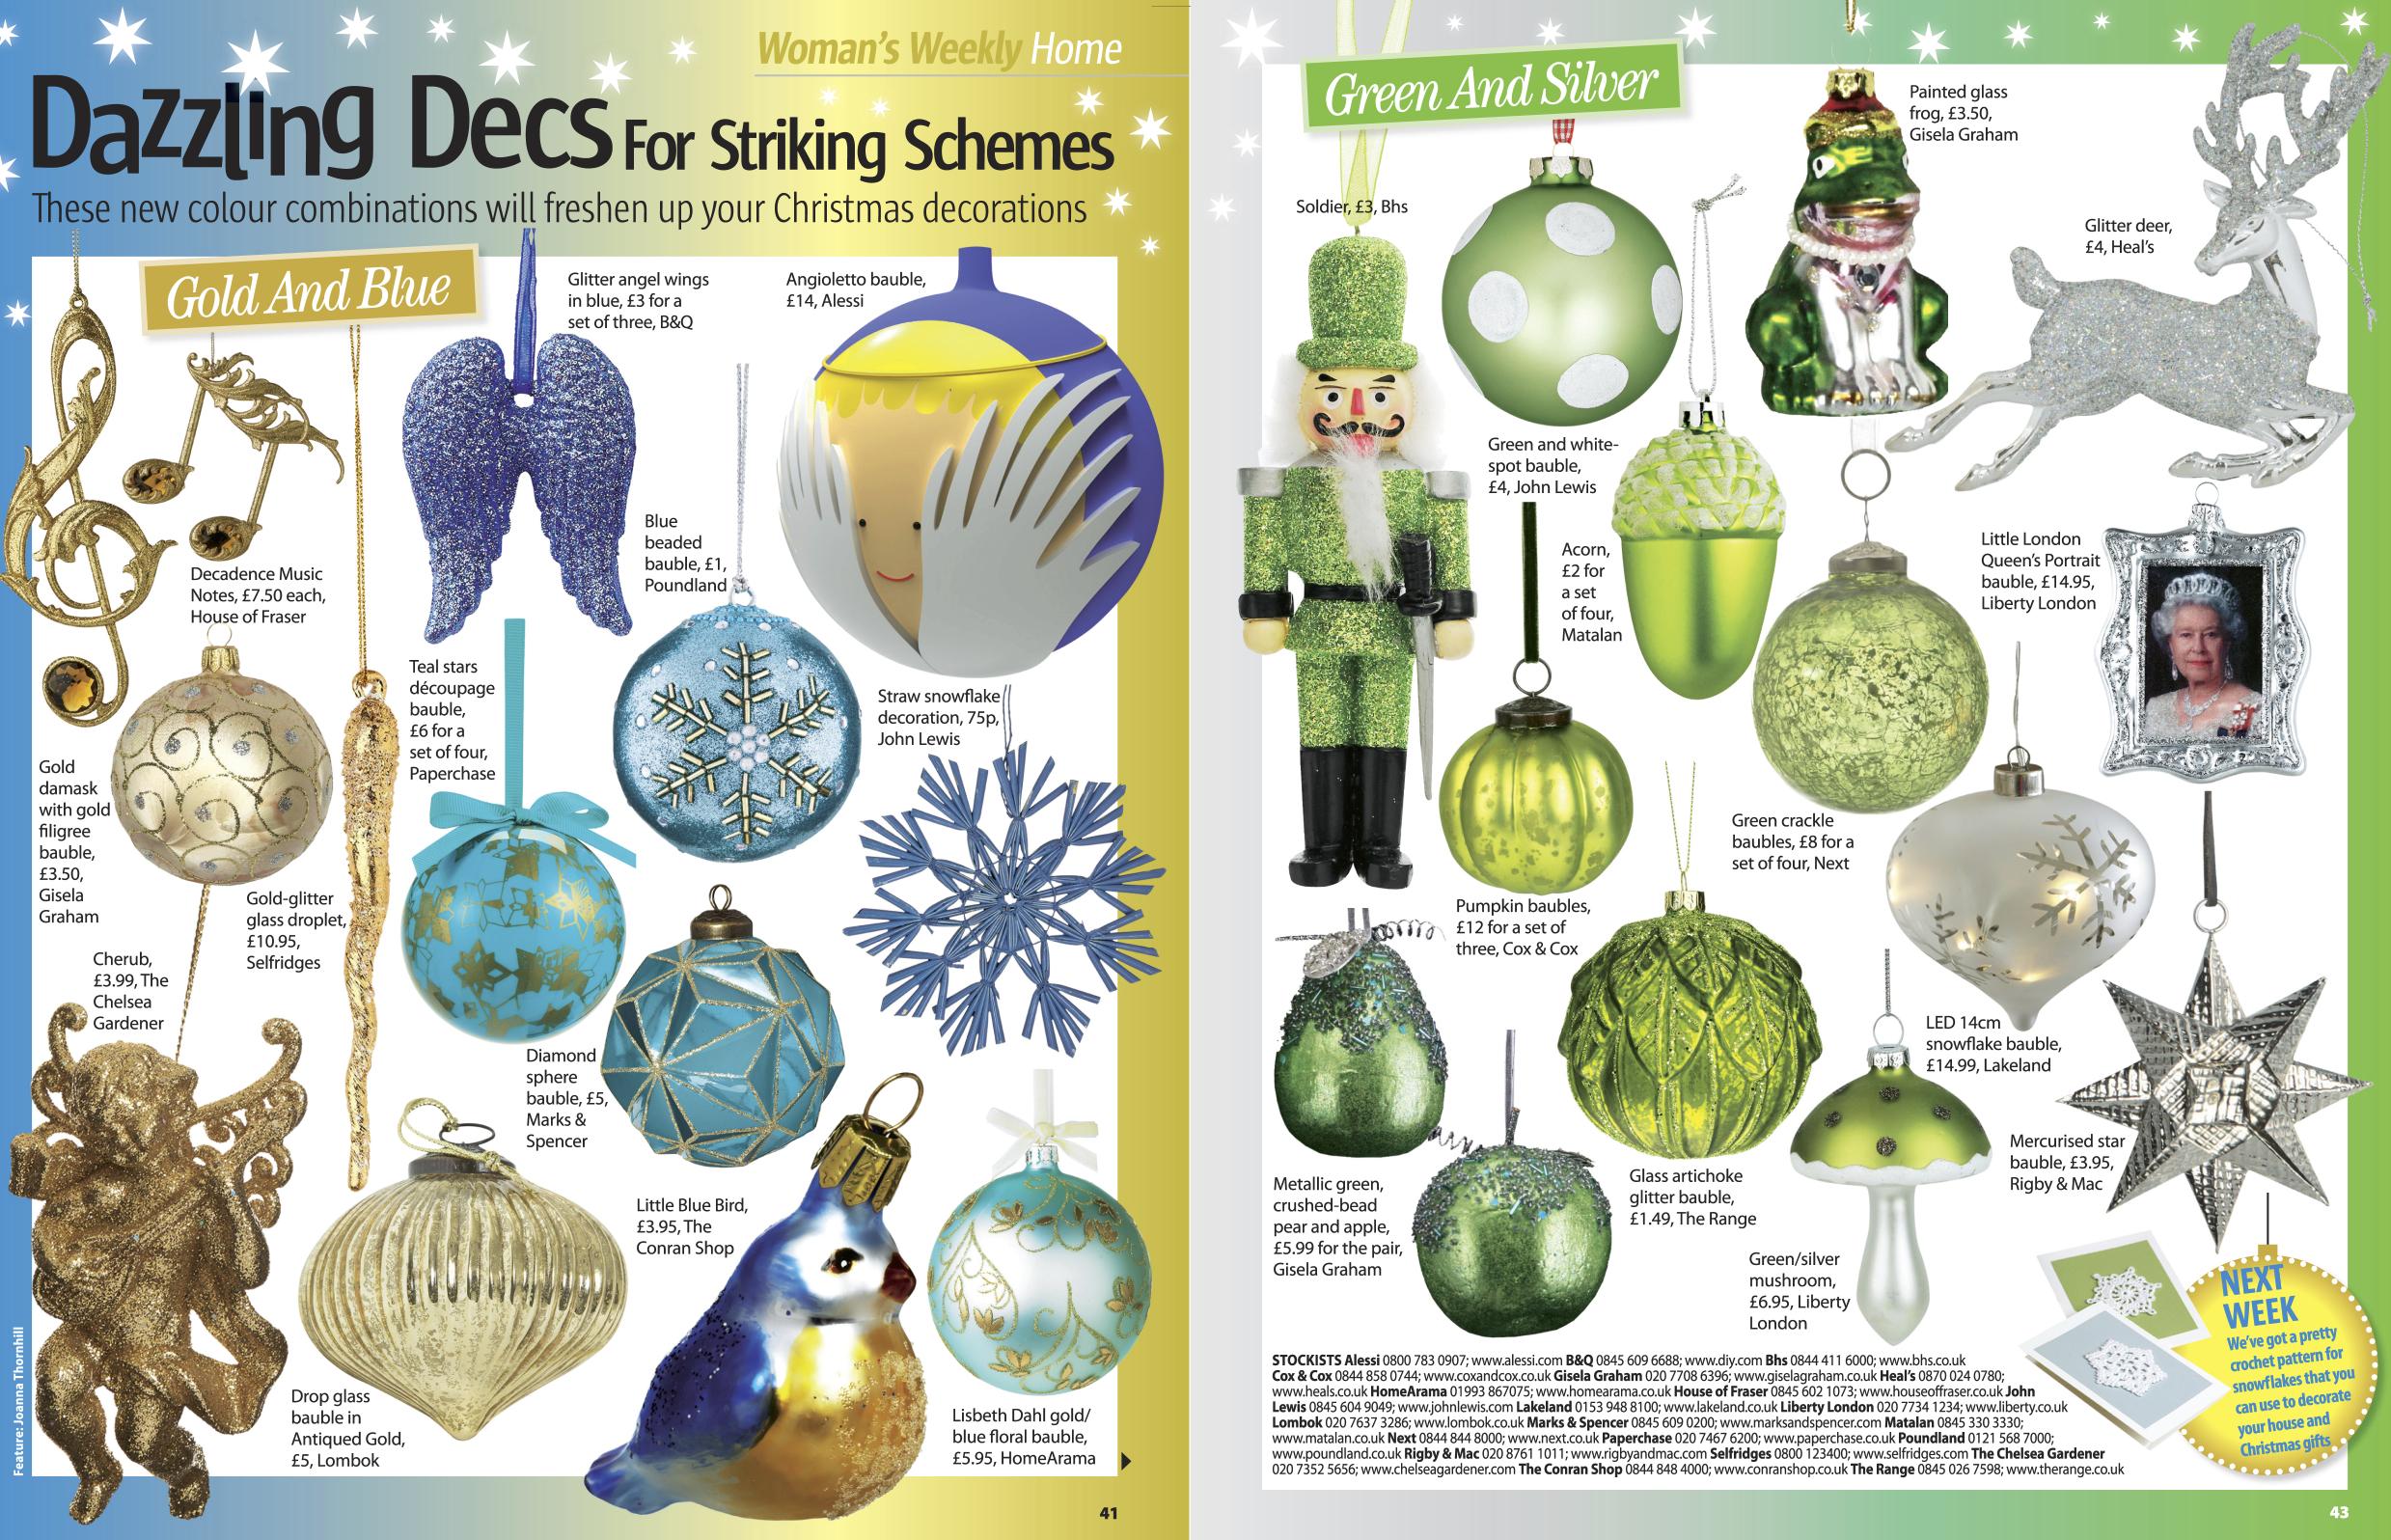 13. Woman's Weekly magazine Dazzling Decs feature by Interior Stylist Joanna Thornhill.jpeg